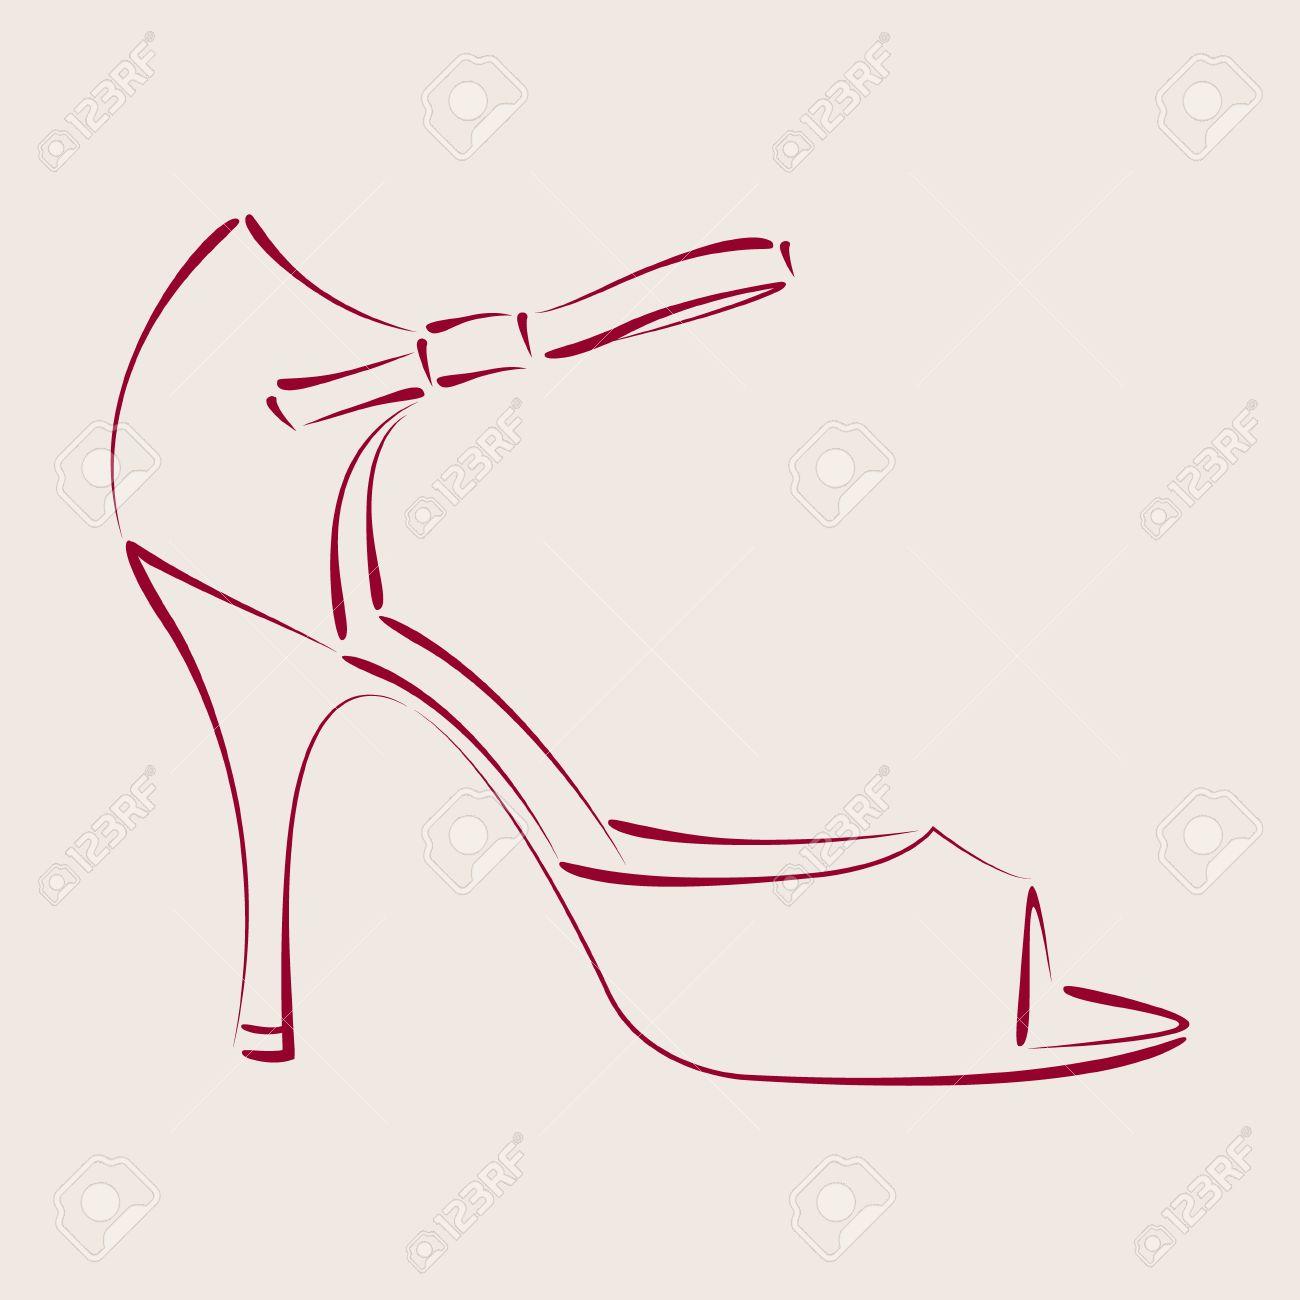 1300x1300 Elegant Sketched Woman S Shoe. Argentine Tango Dance Shoes